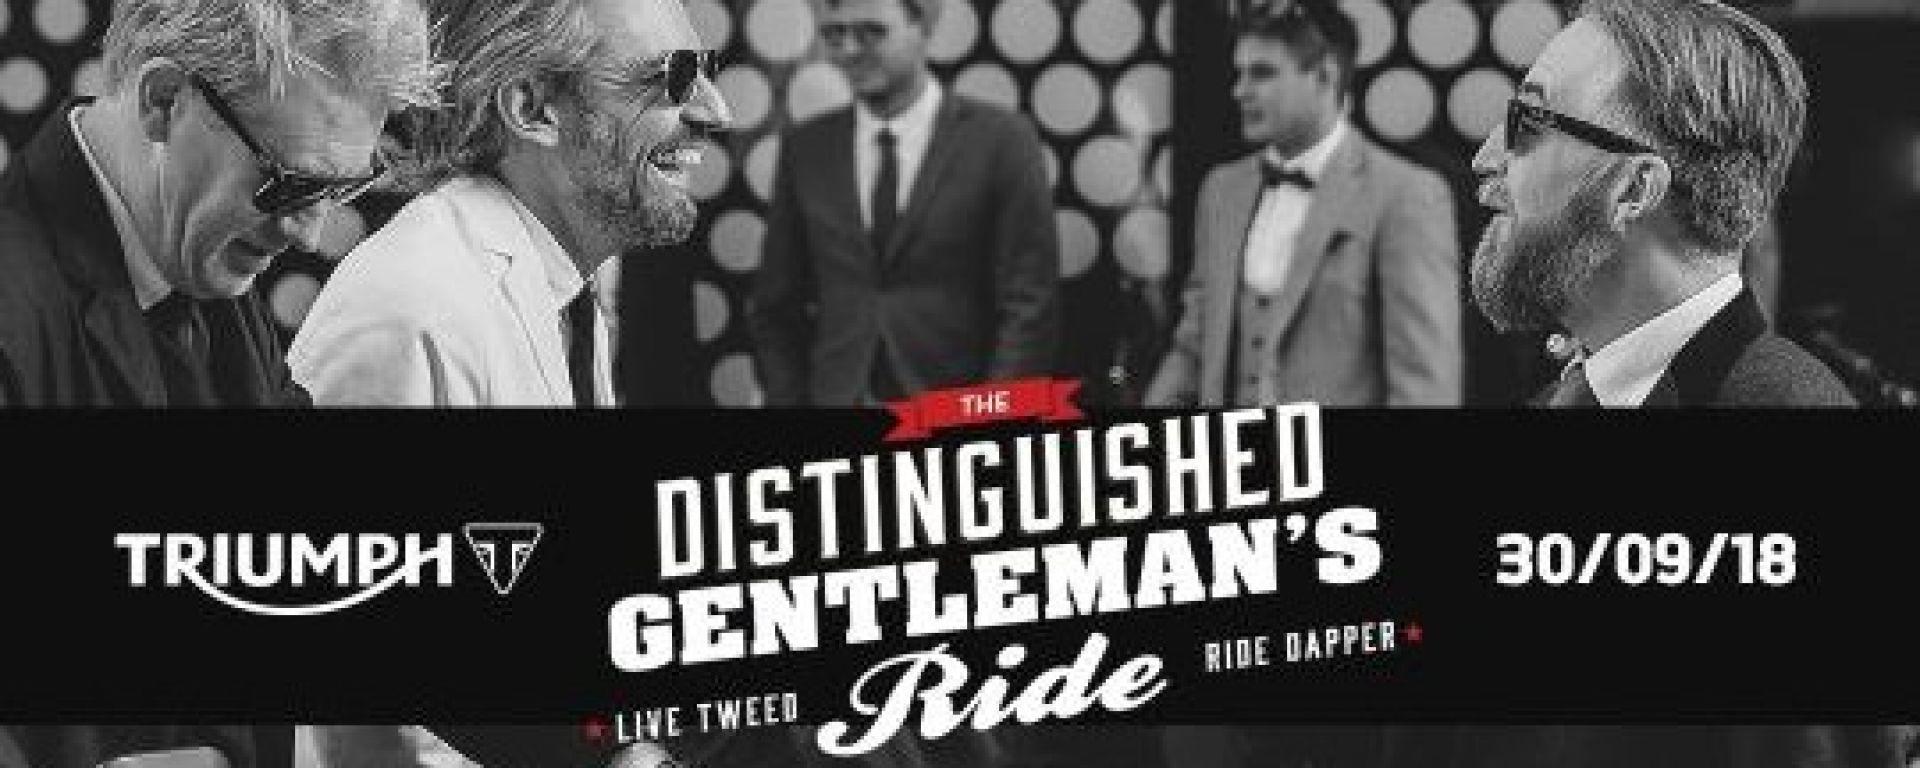 Triumph è il main sponsor del Distinguished Gentleman 2018